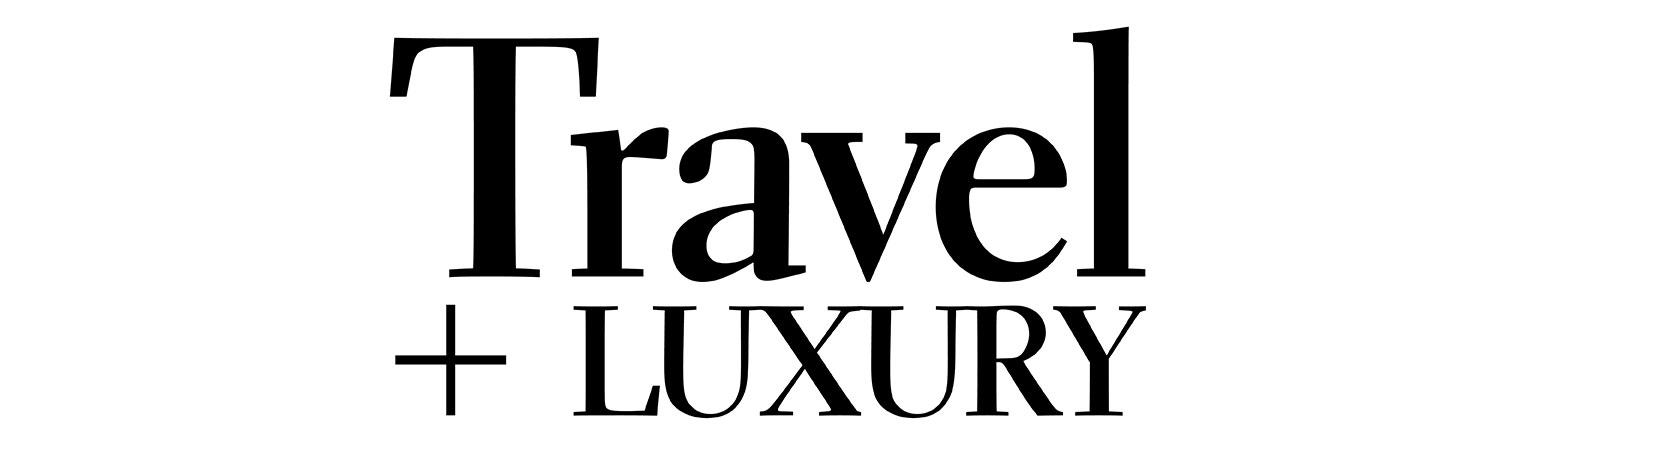 Travel + Luxury, The Weekend Australian